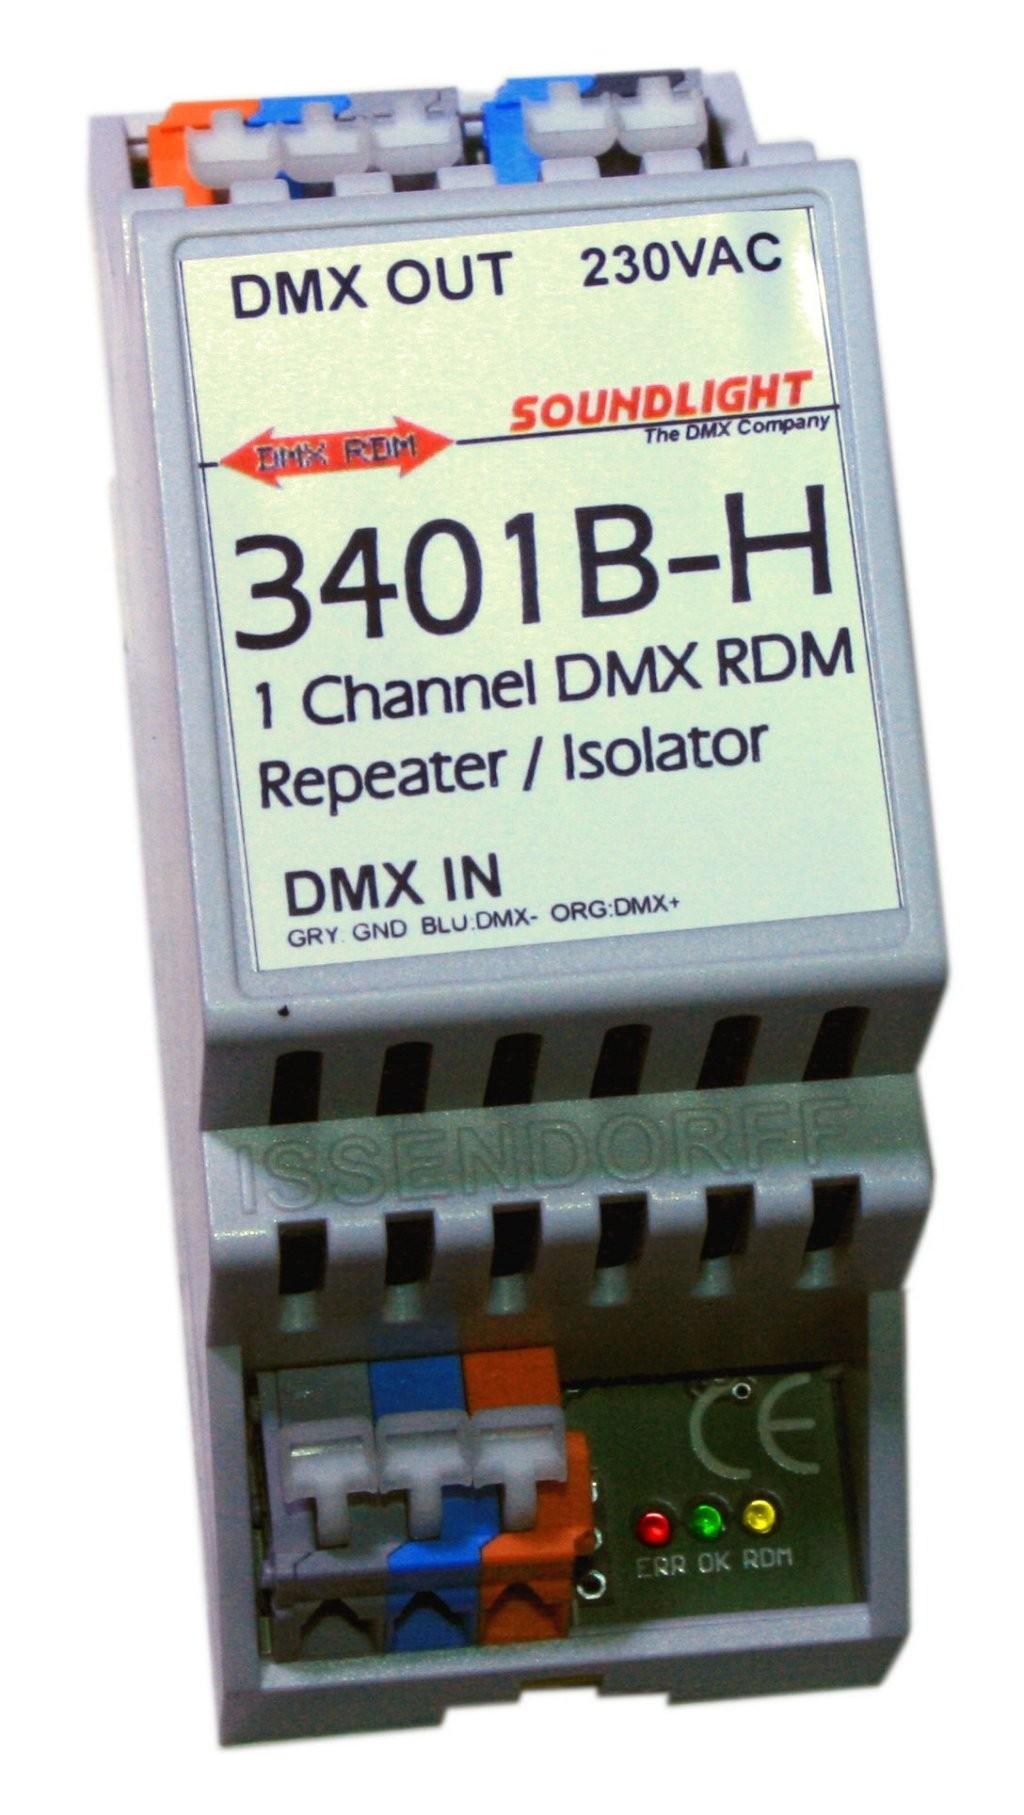 3401B-H | DMX RDM linedriver/booster, RDM